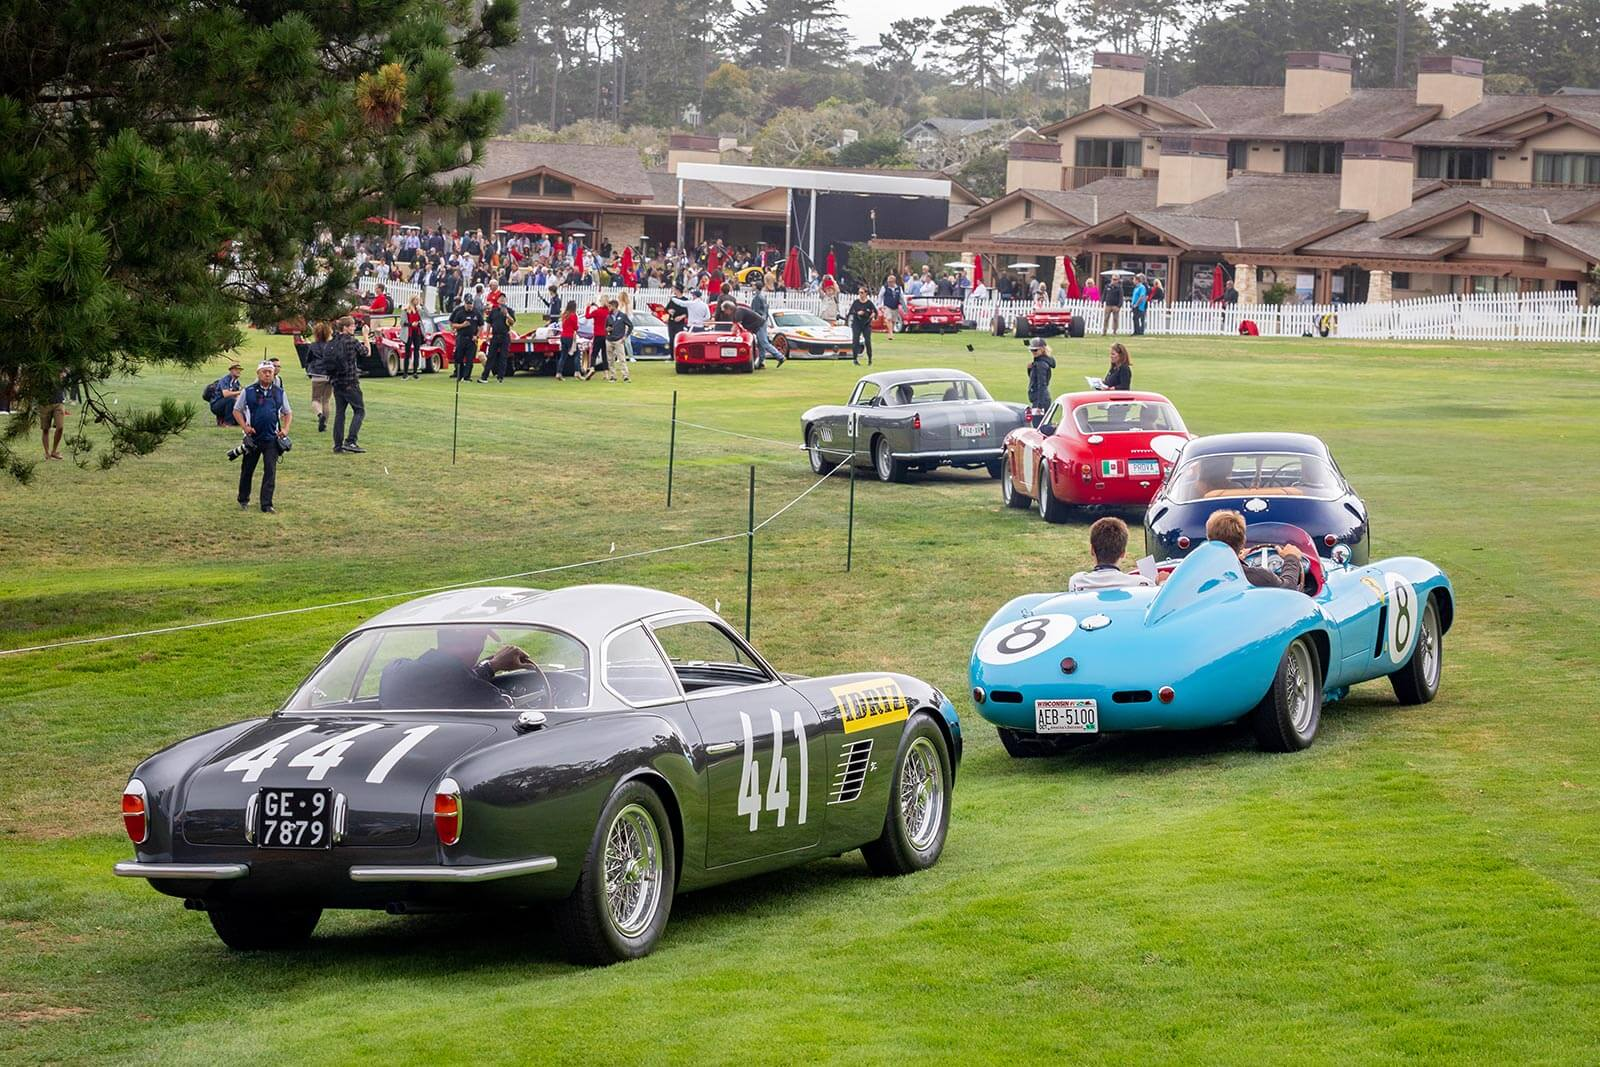 Ferrari Parade at Pebble Beach Concours